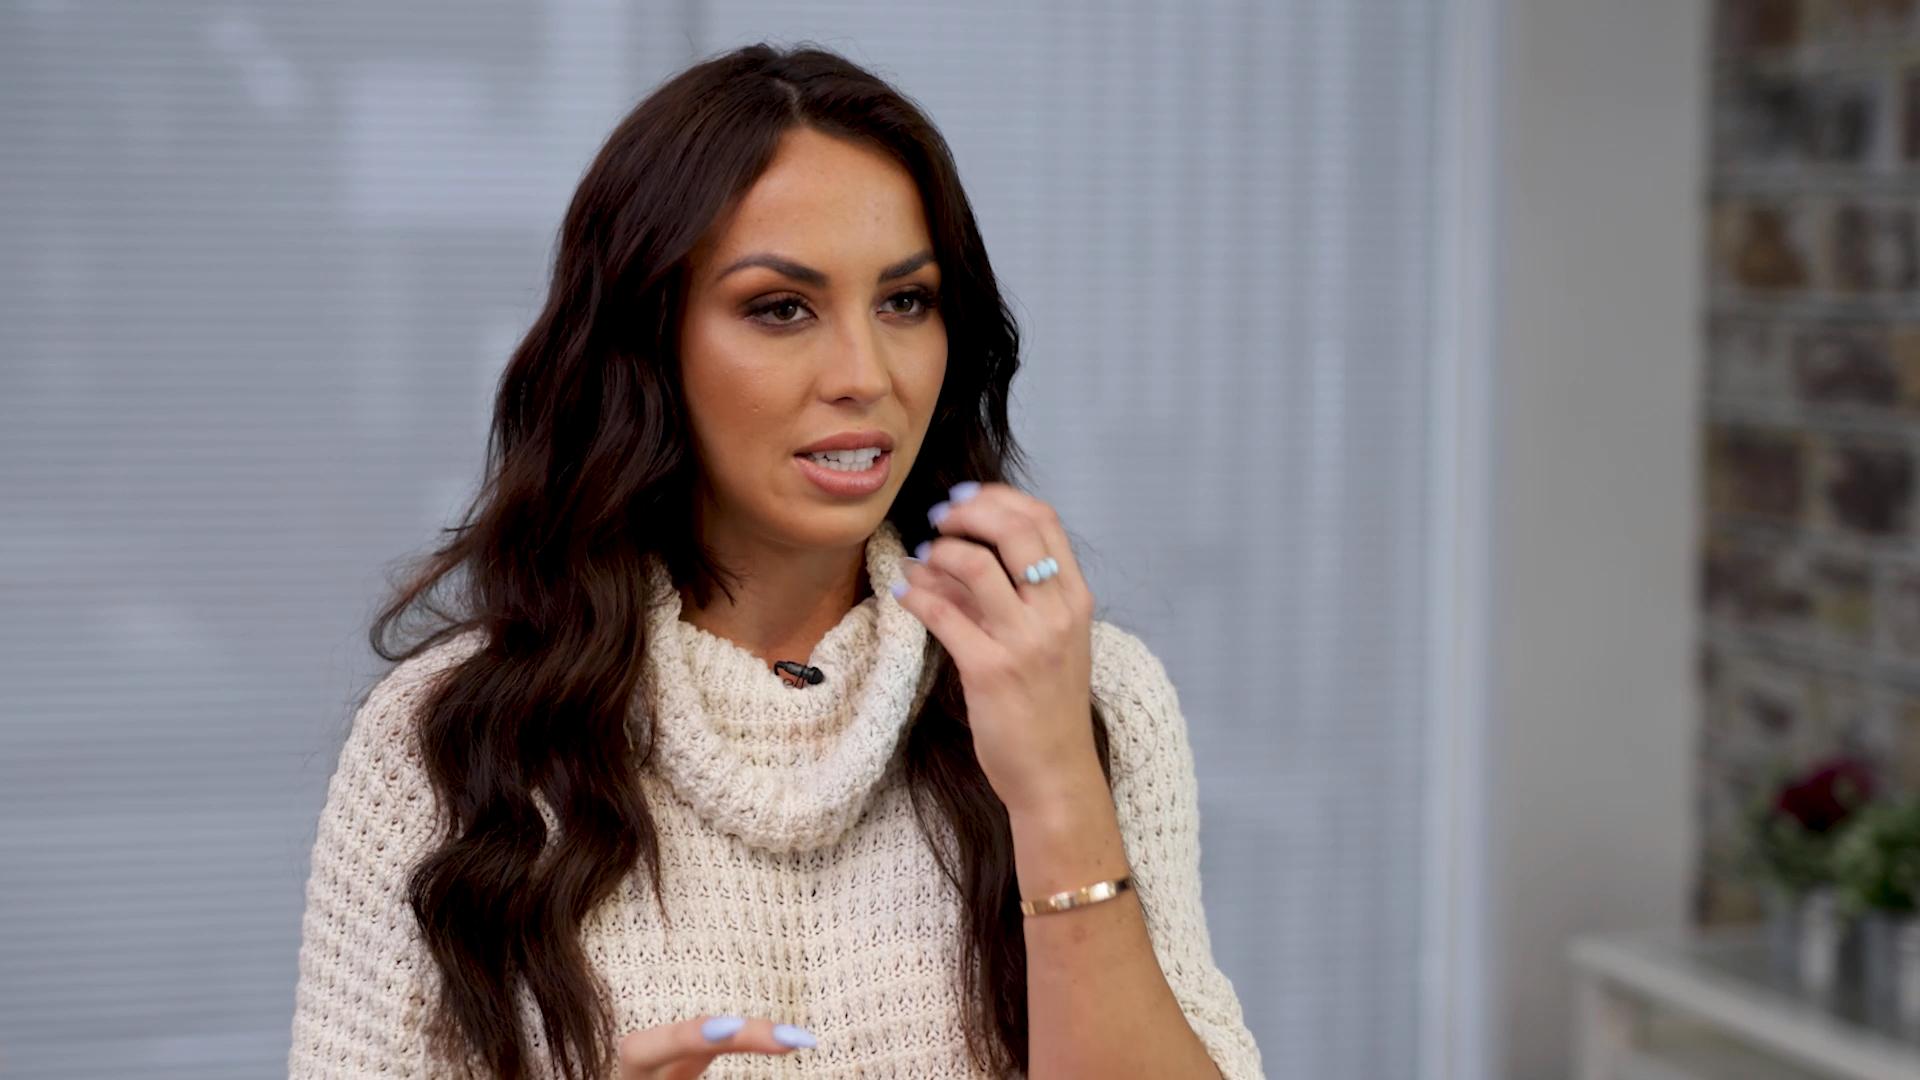 Natasha reveals her lip plumping side hustle